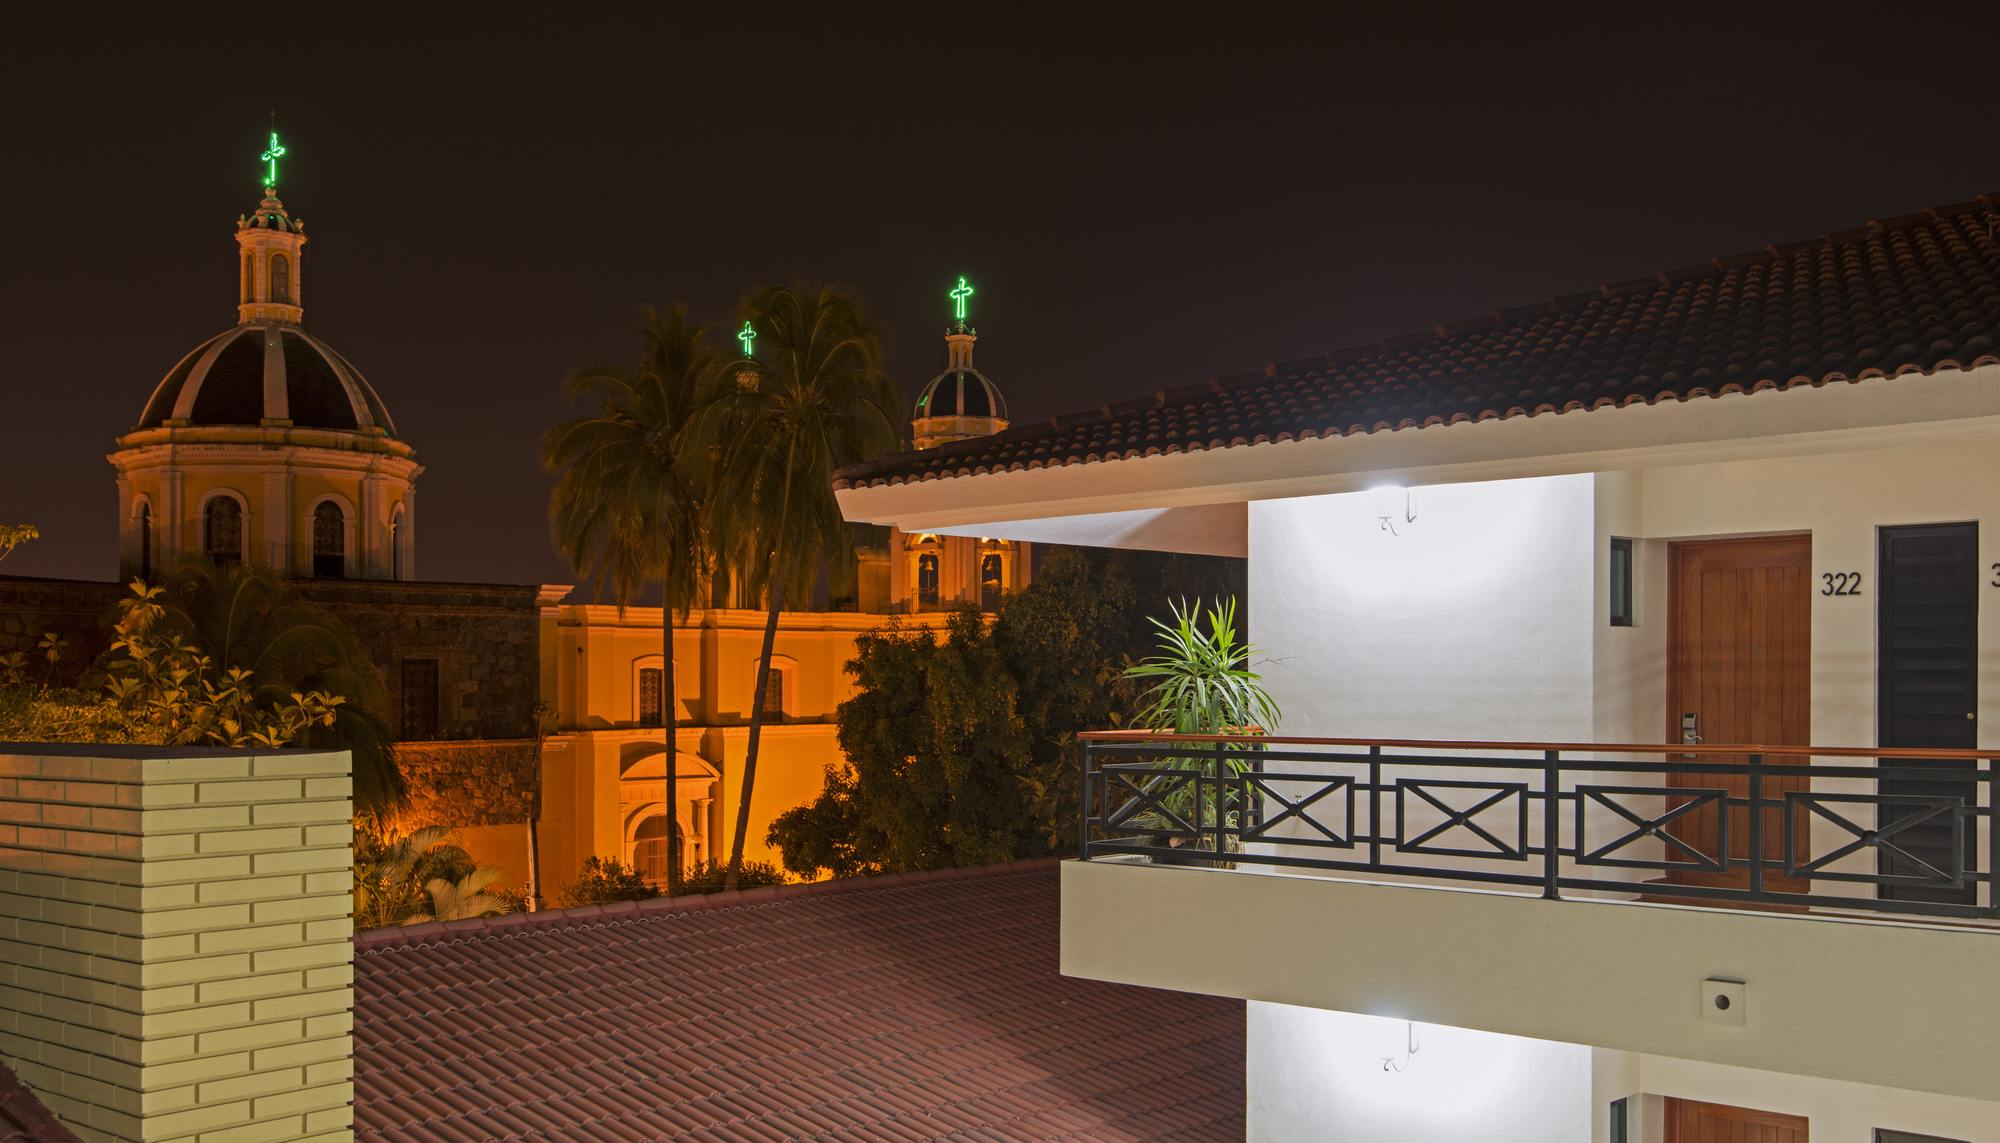 Detail hotel for Jardin de villa de alvarez